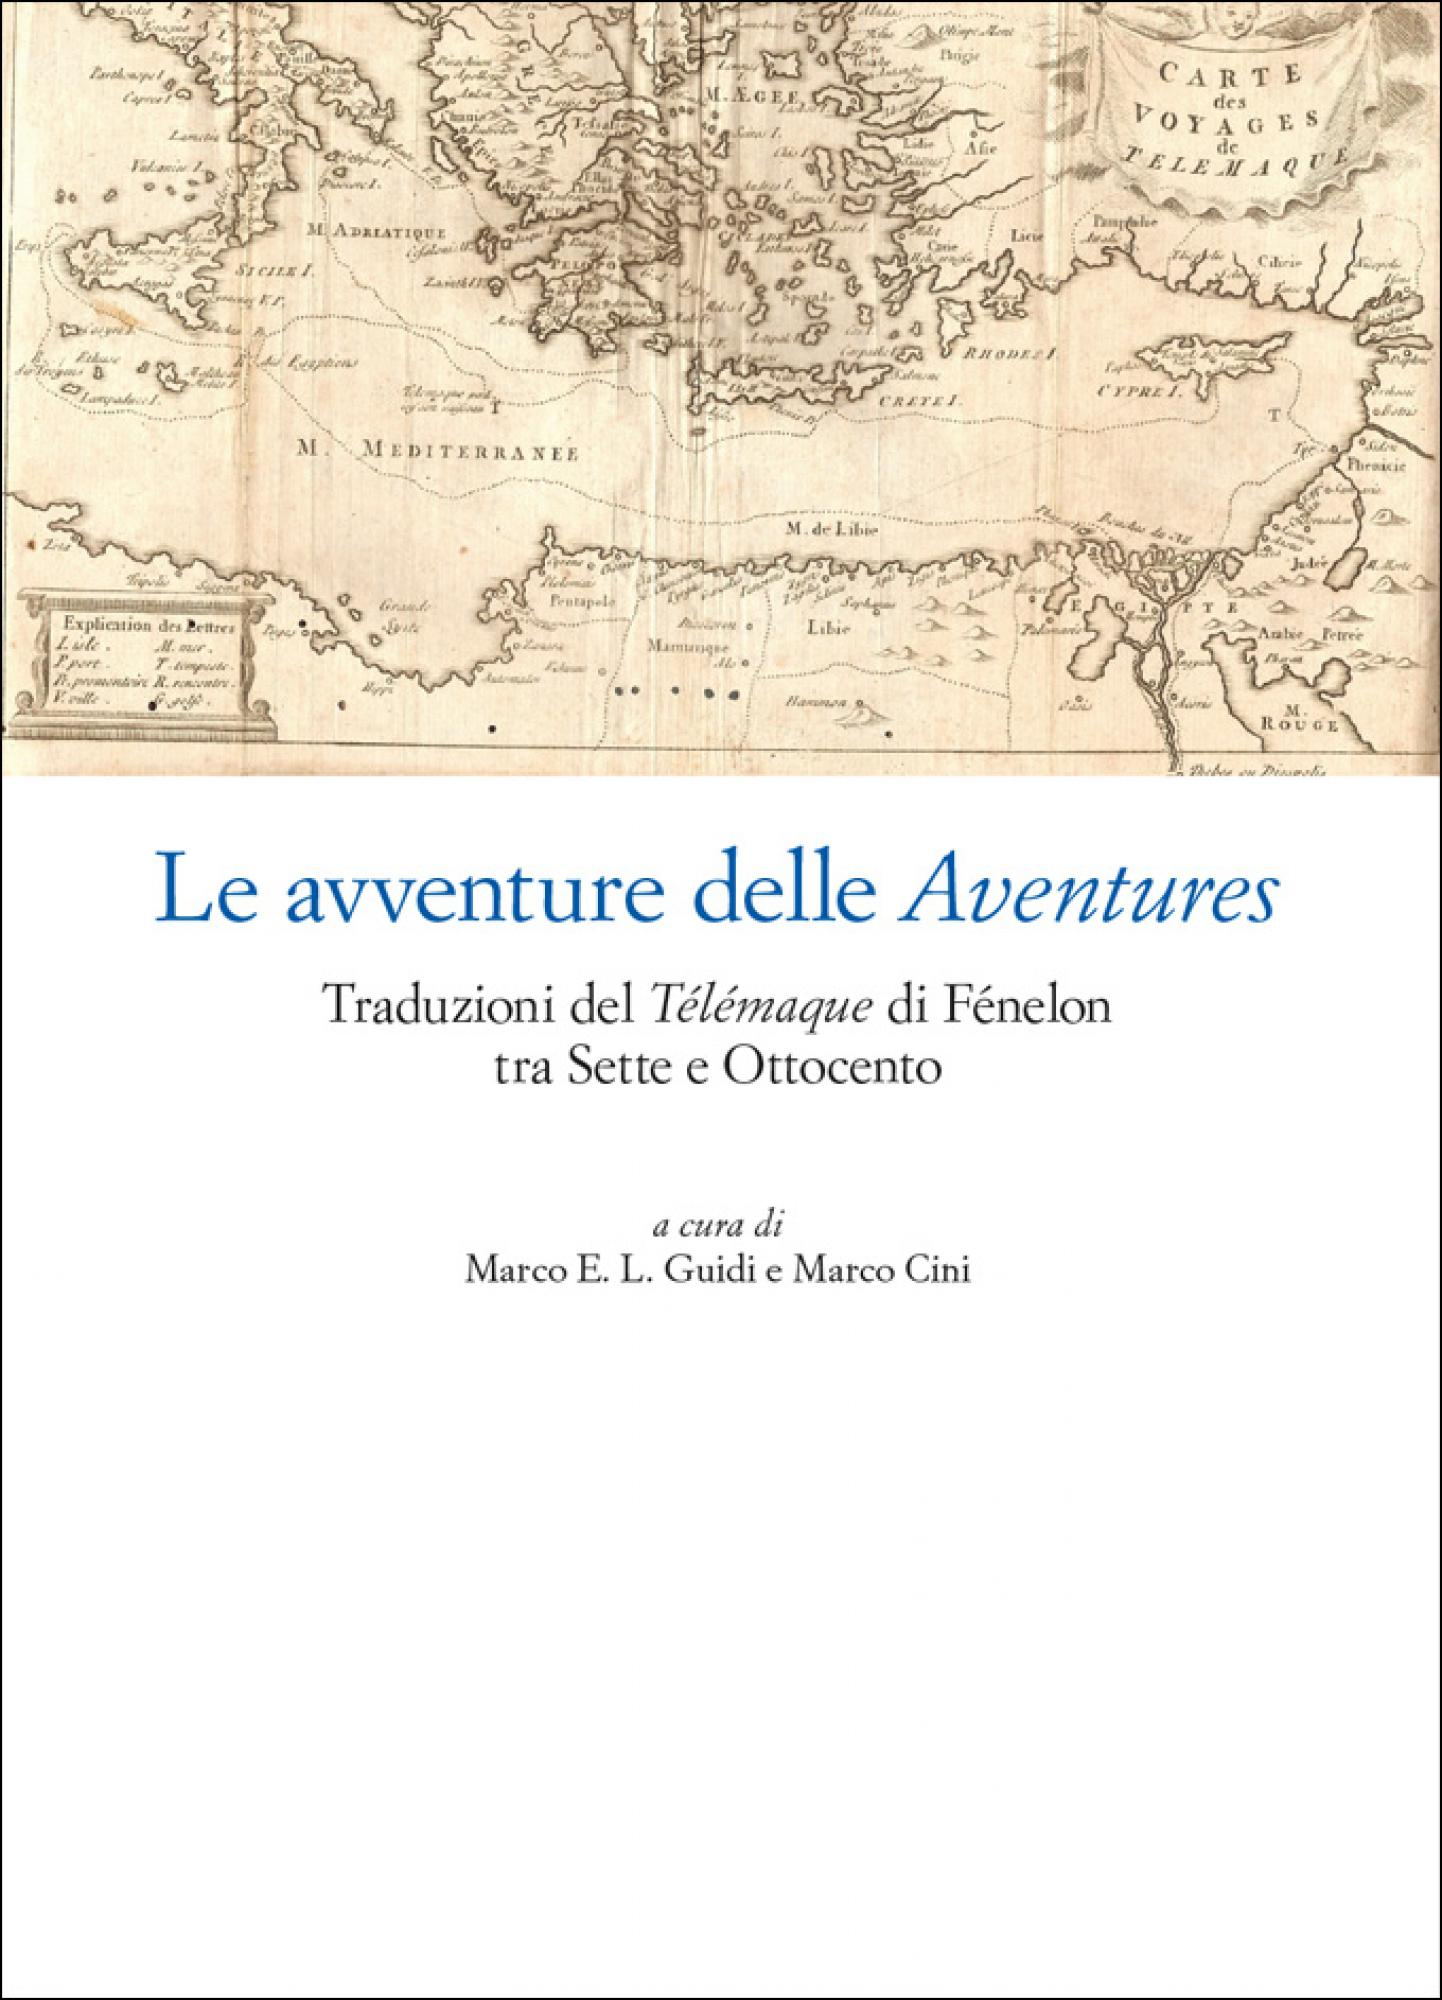 Le avventure delle Aventures.Traduzioni del <em>Télémaque</em> di Fénelon tra Sette e Ottocento